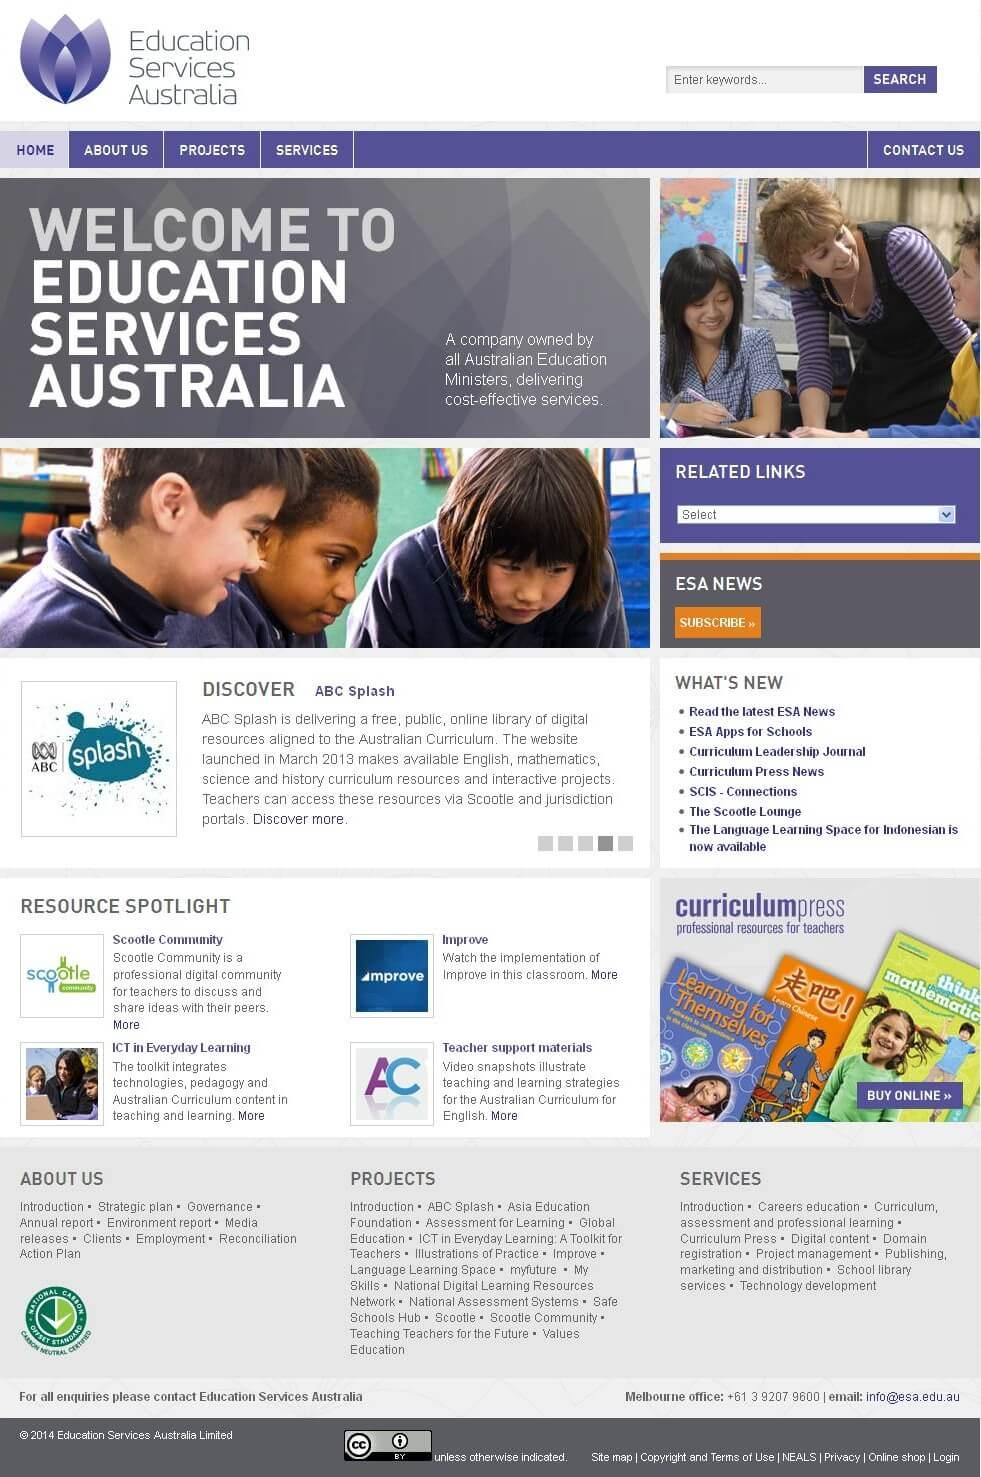 Design & Development of an e-learning Portal